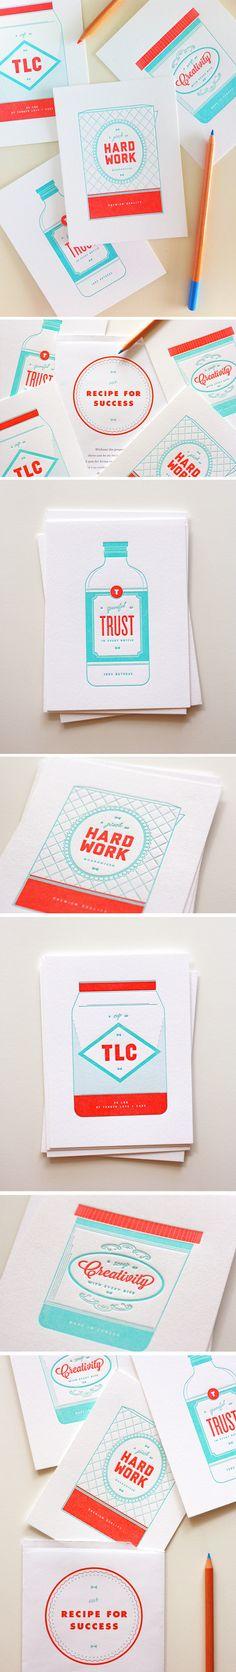 Recipe for Success Series - One Plus One Design #Stationery #Design #Illustration